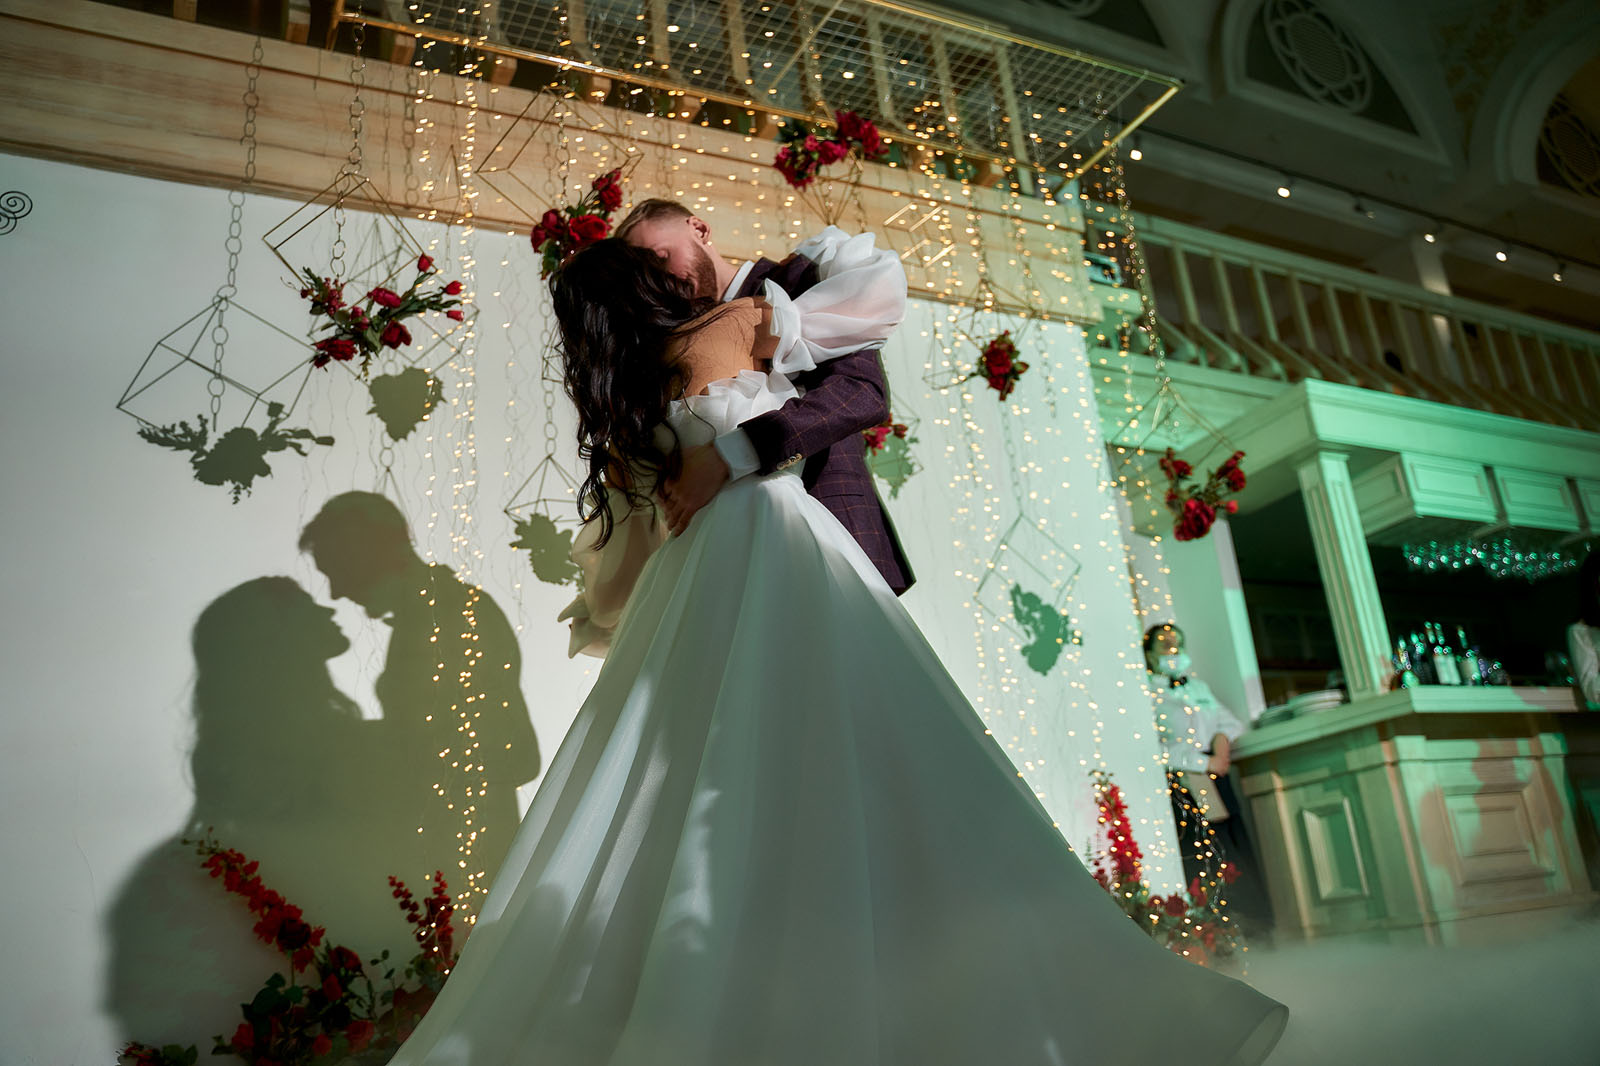 wedding@bekarev2021-04-10-18-17-10.jpg